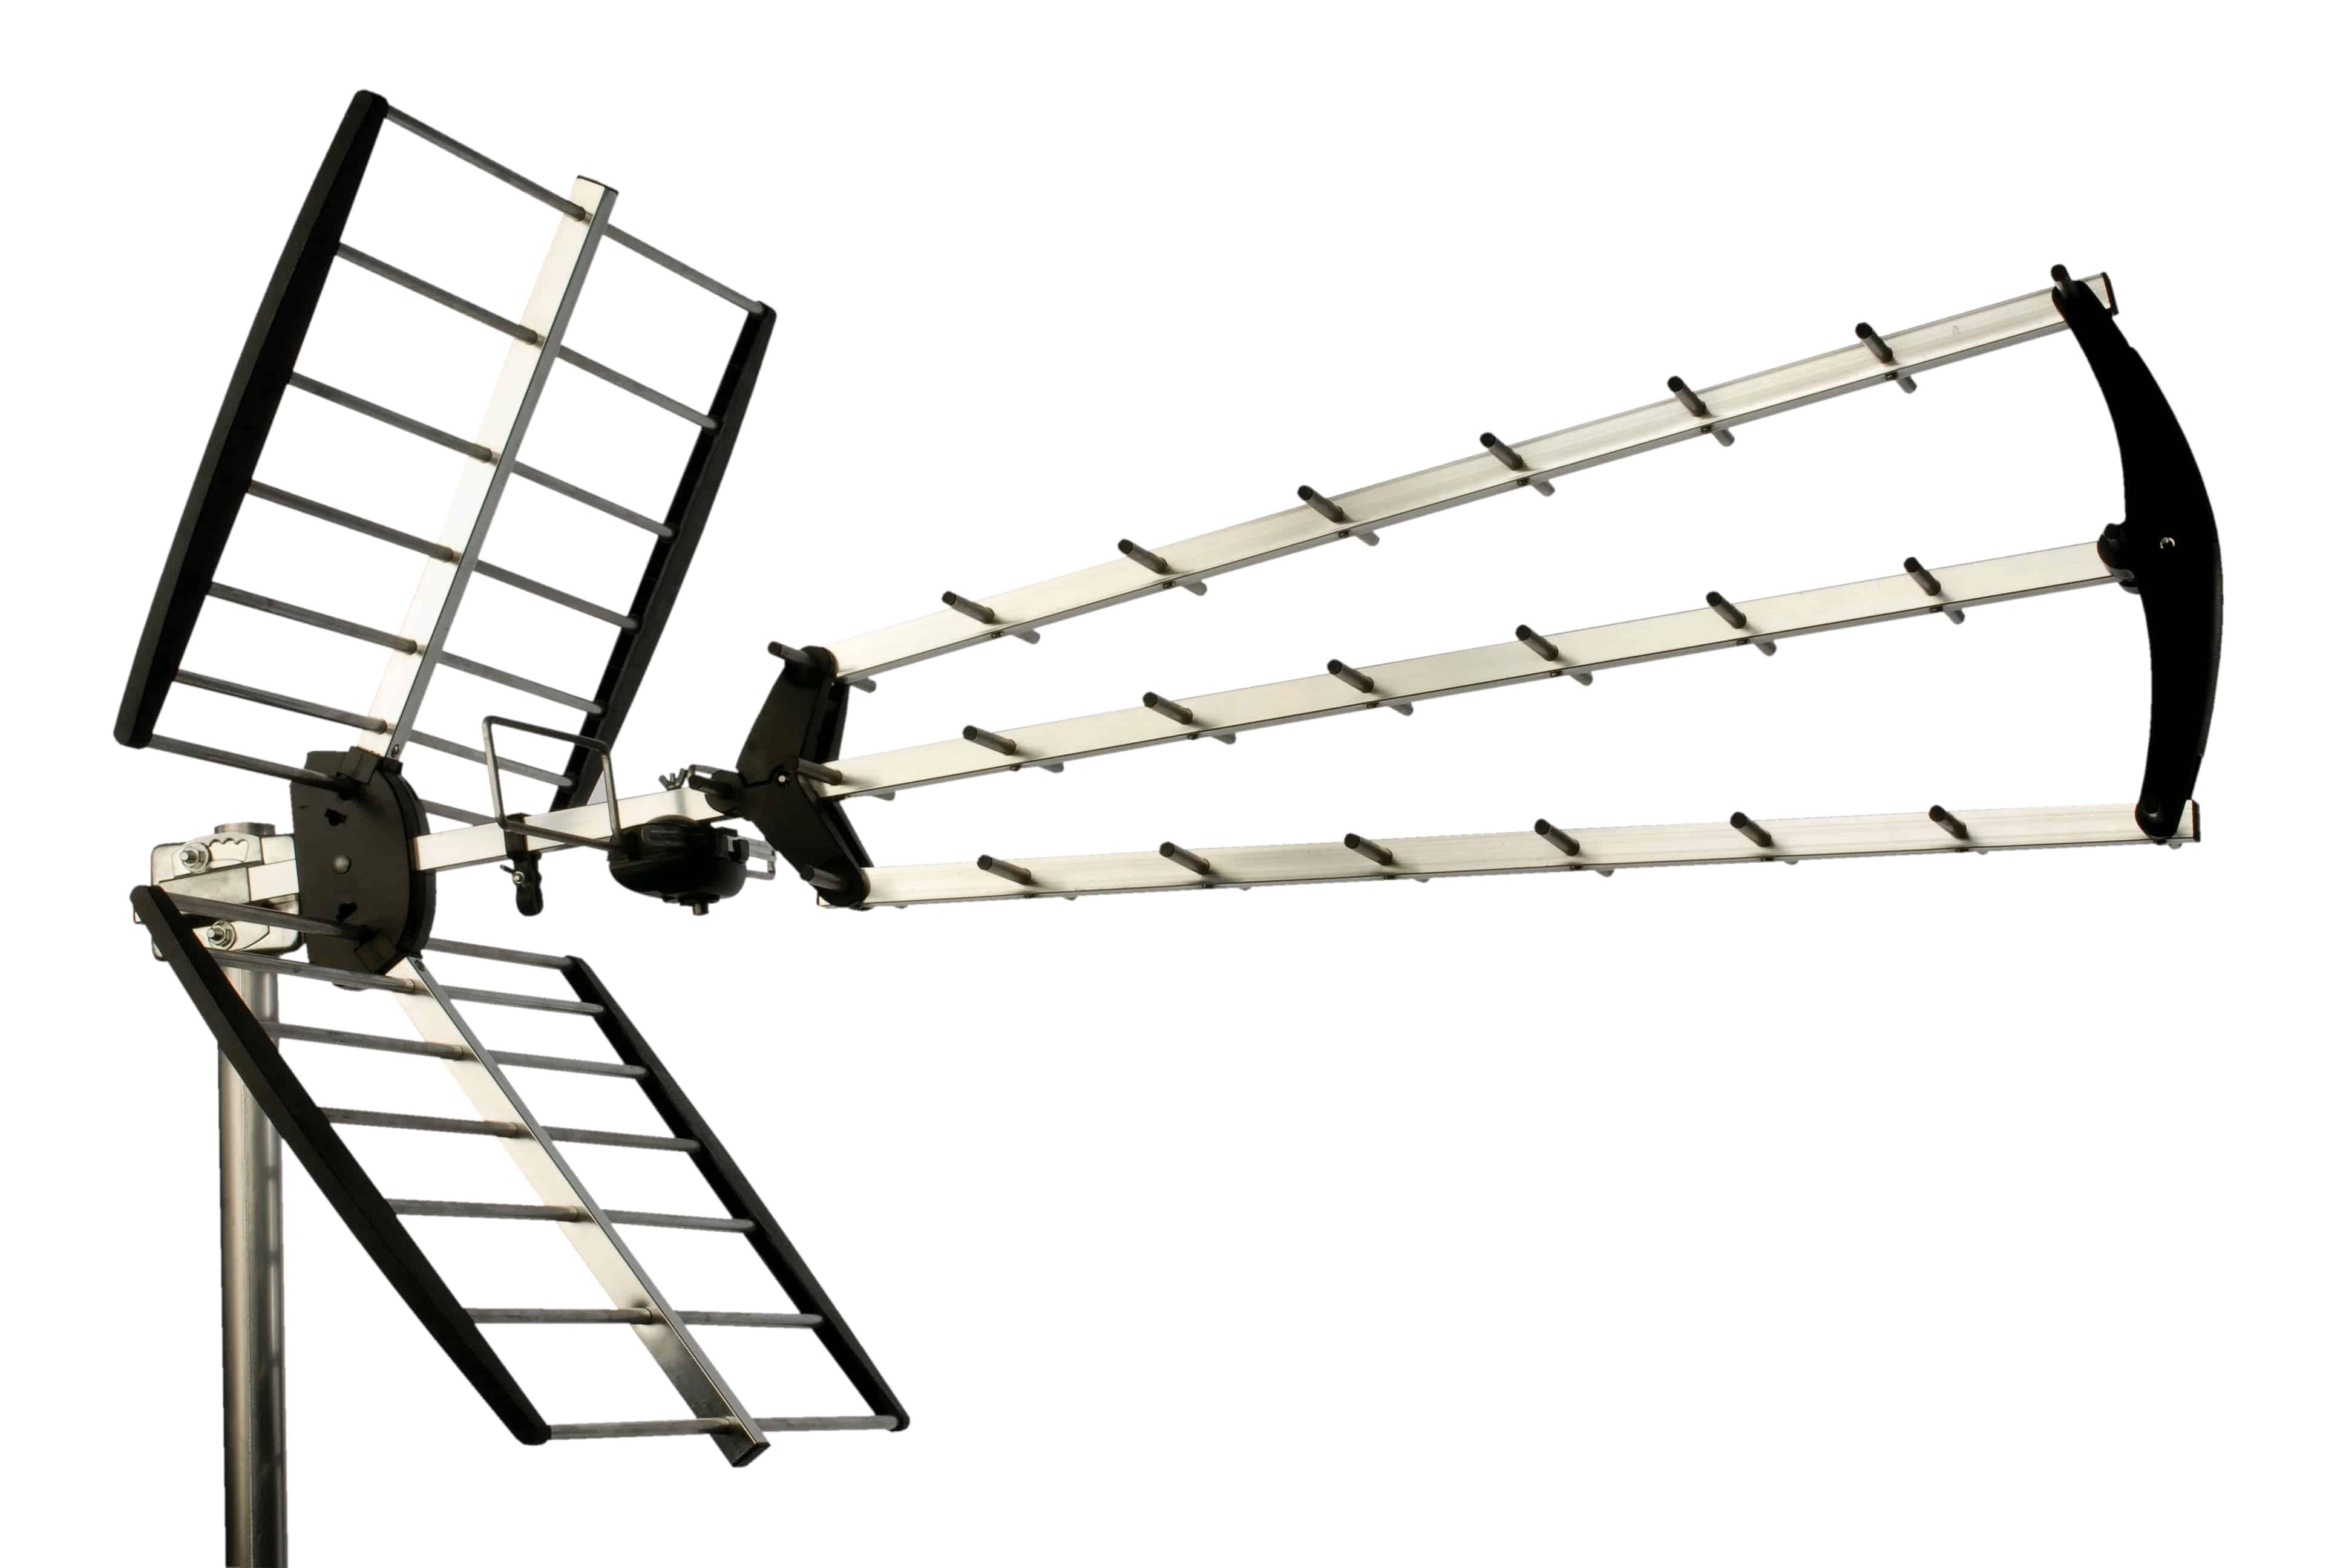 Antiference XT87 Triple Boom Aerial